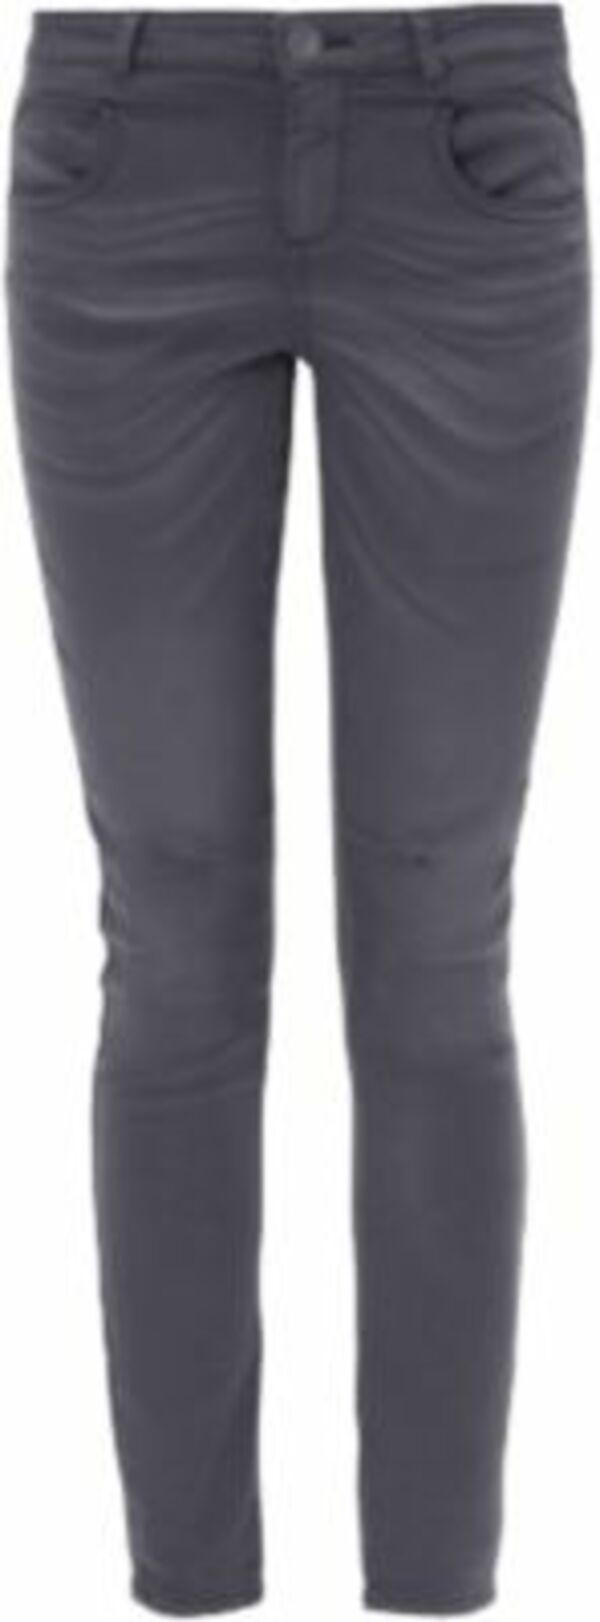 Jeans Shape Casual Bowleg Gr. 44/L32 Damen Kinder